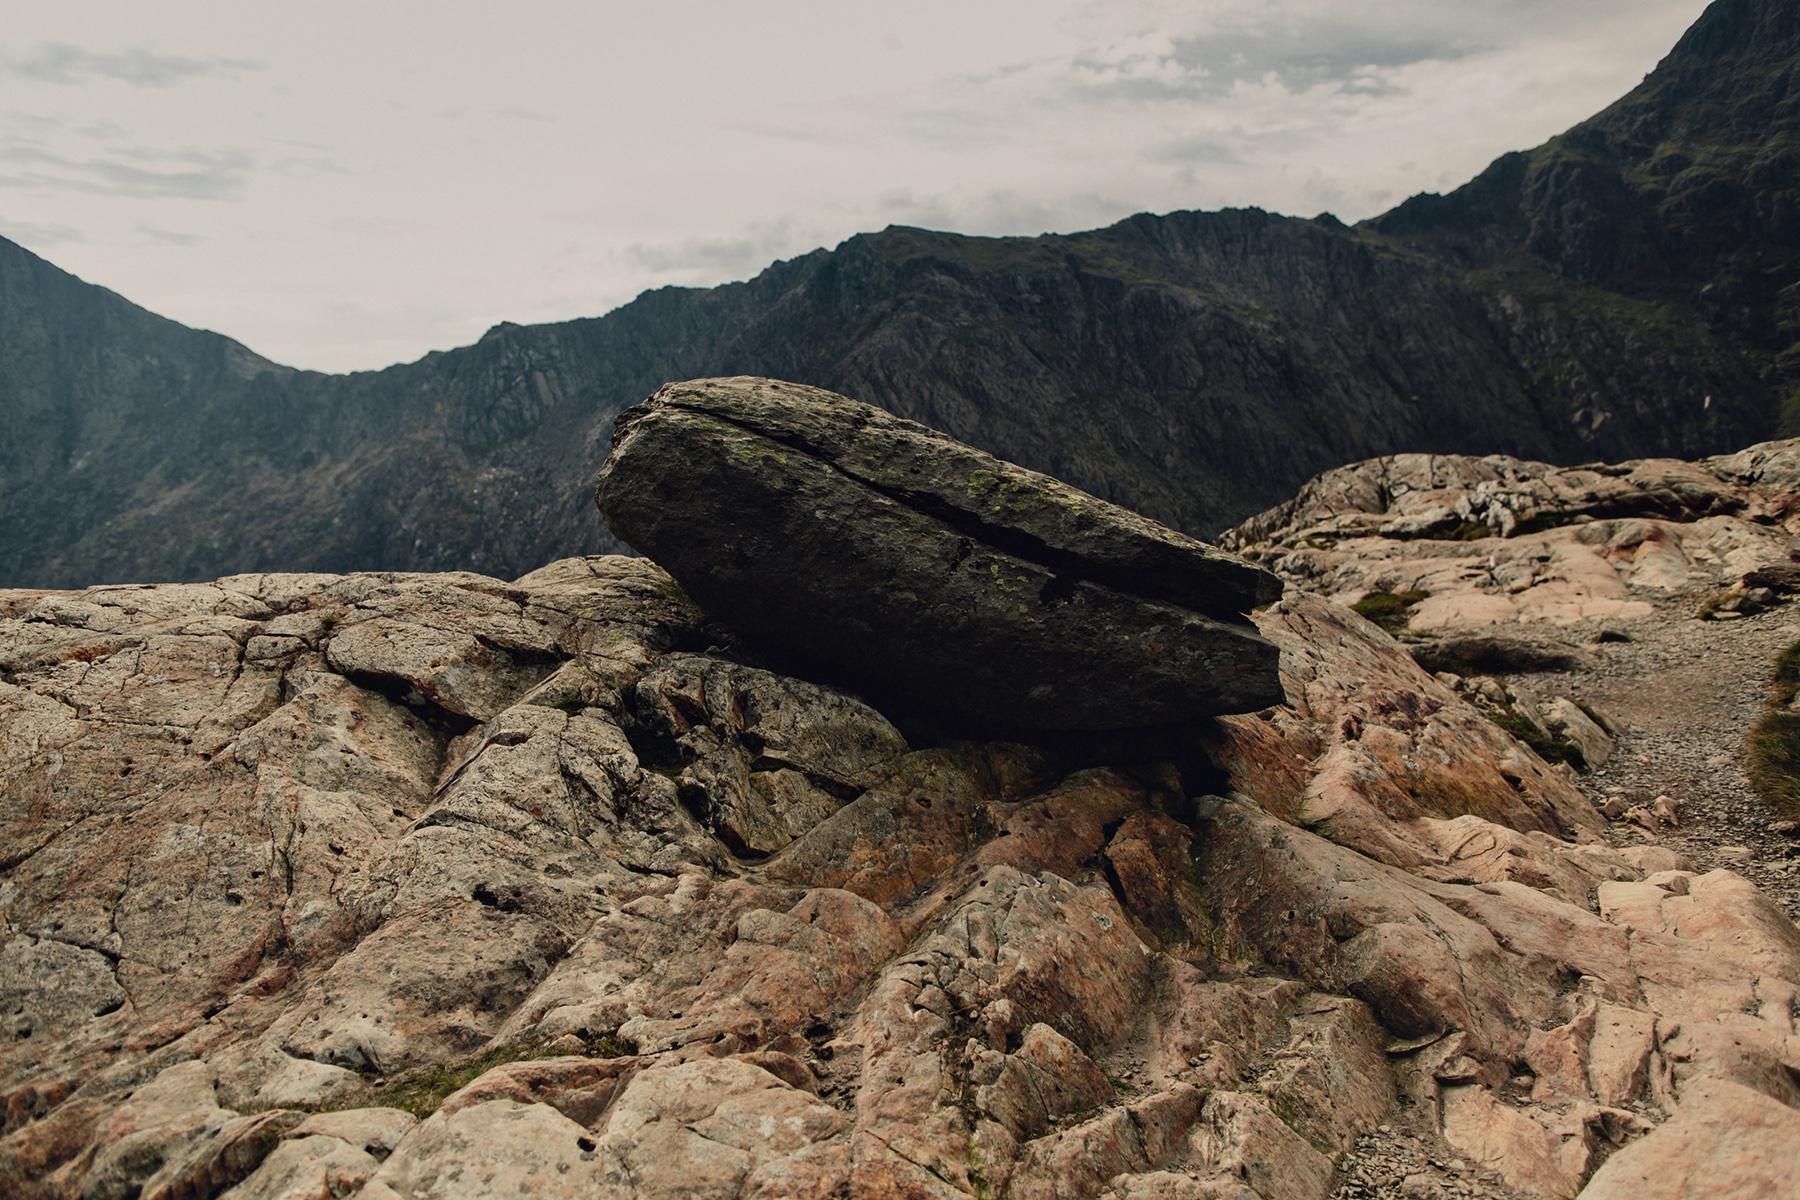 Mt-Snowdon-Hike-Photos-From-Peny-Pass-00111.jpg